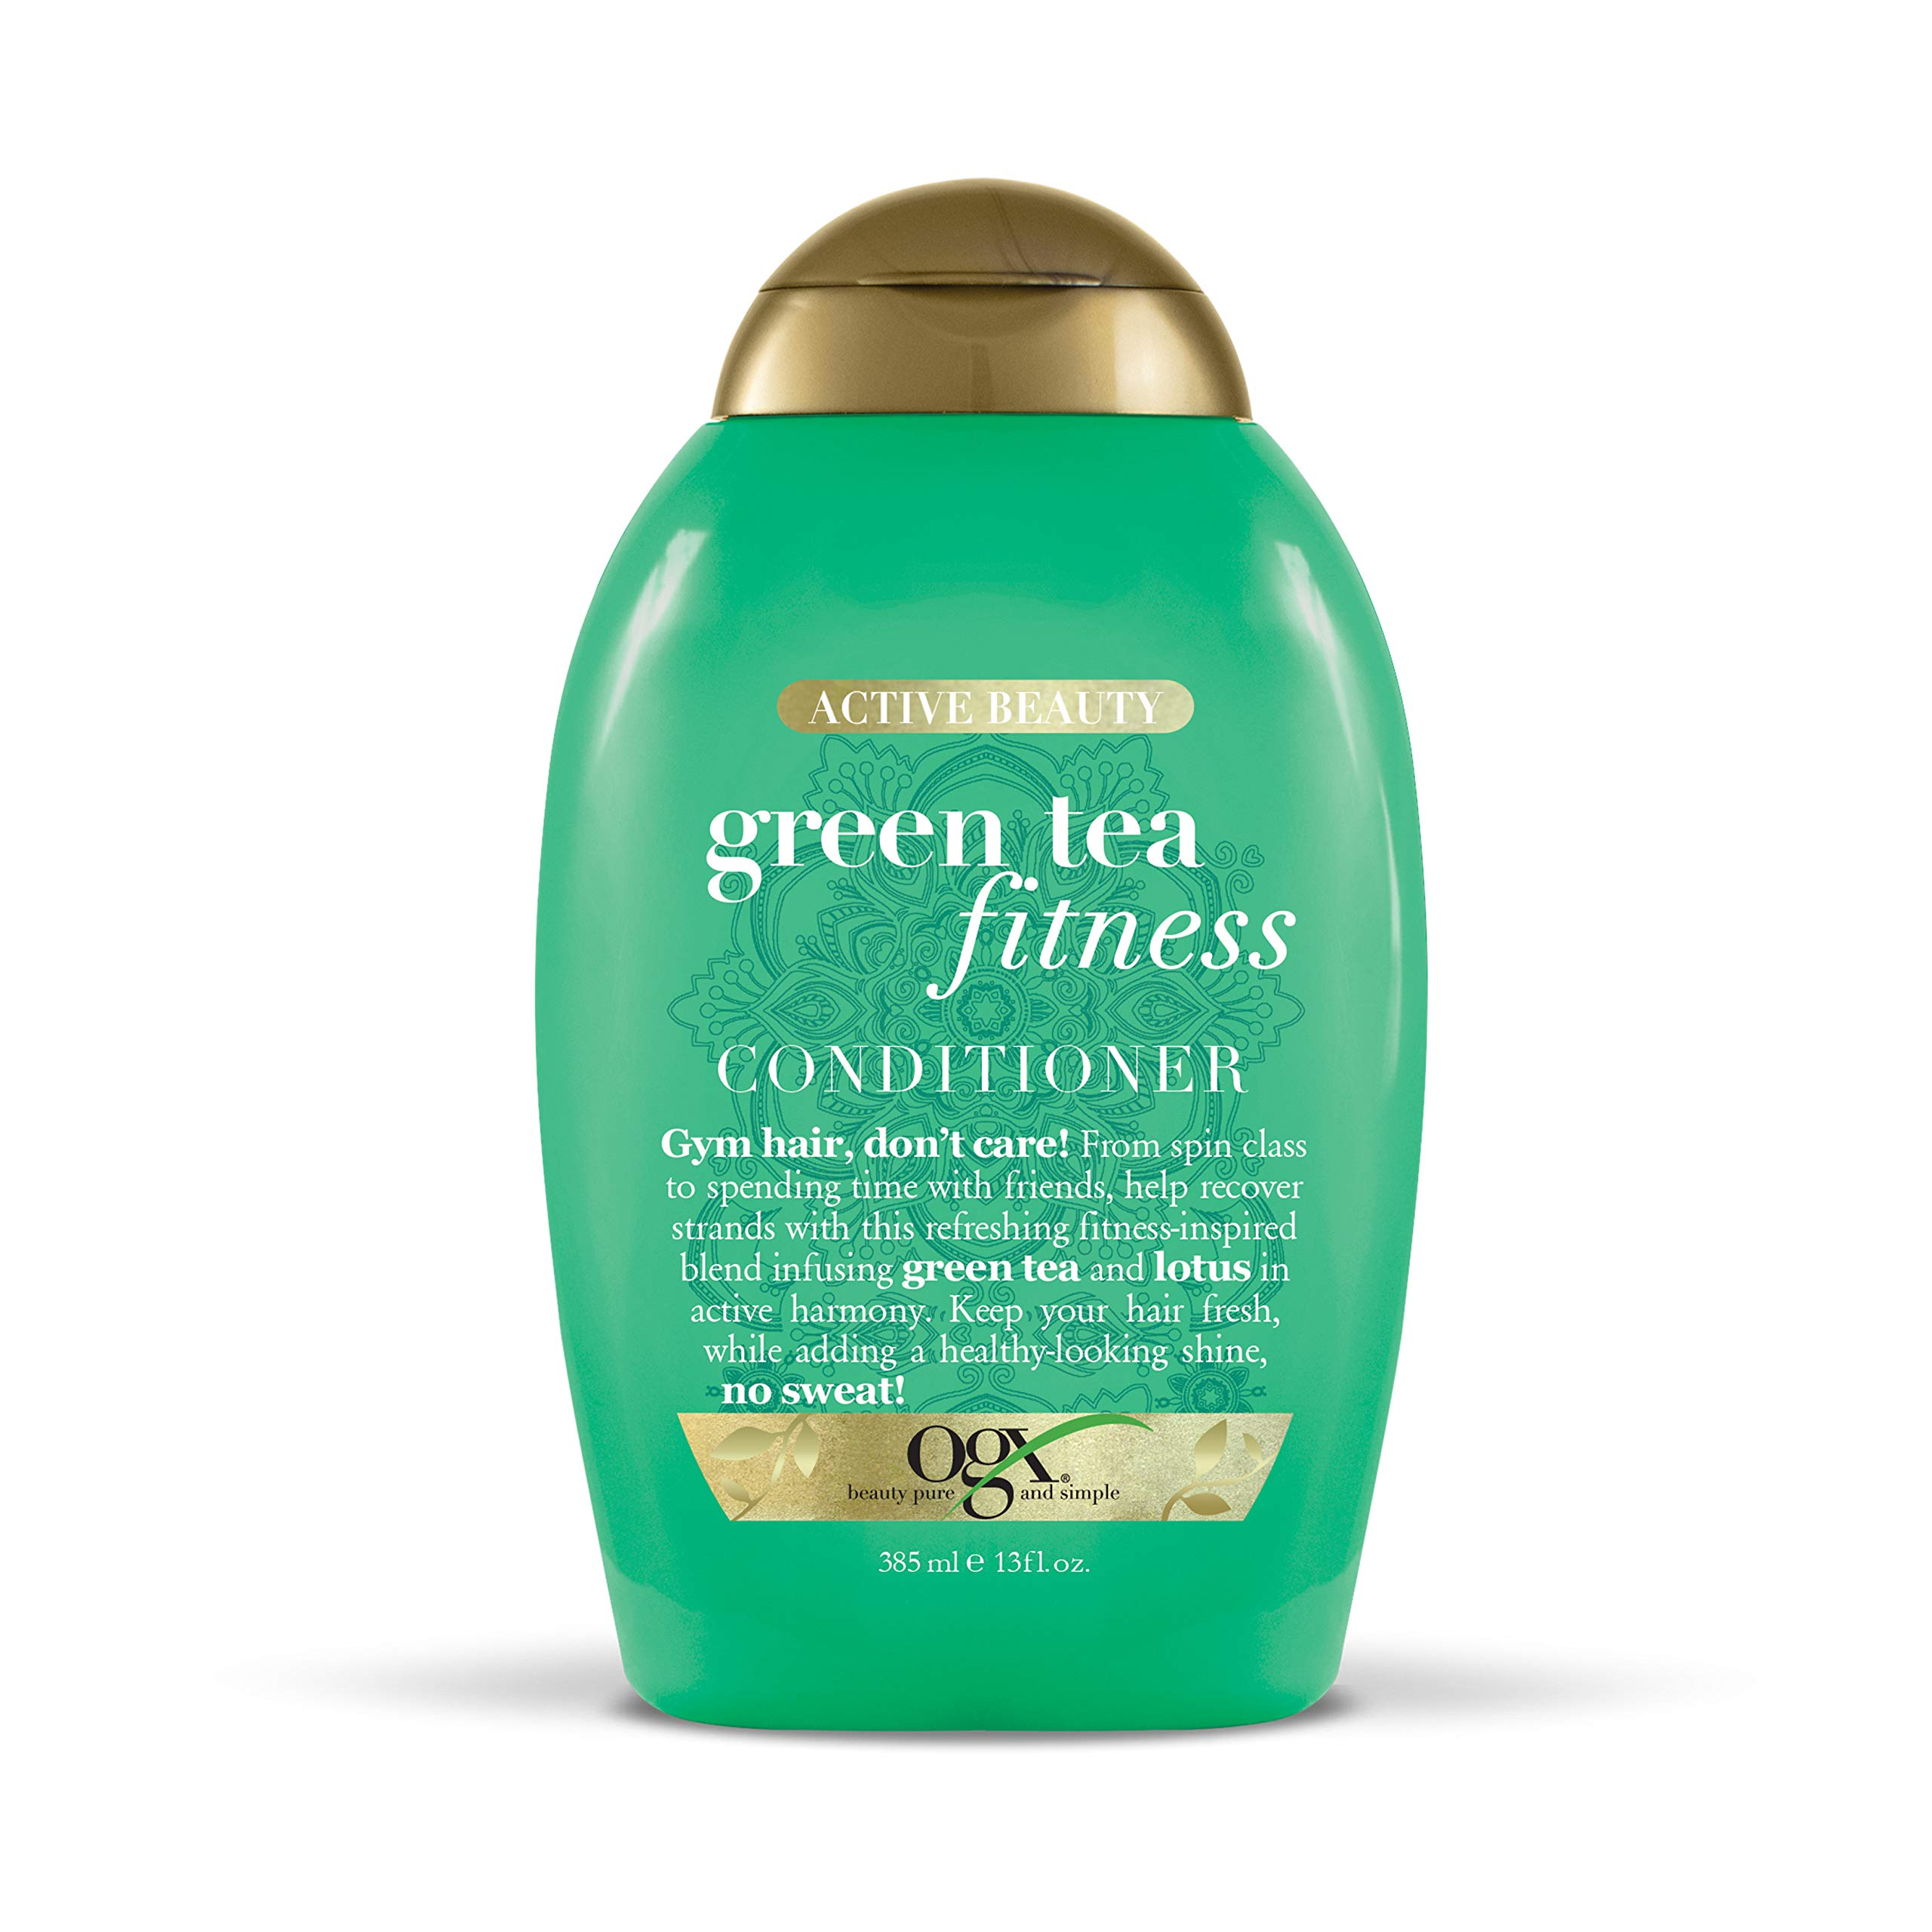 Amazon.com: OGX Active Beauty Green Tea Fitness Dry